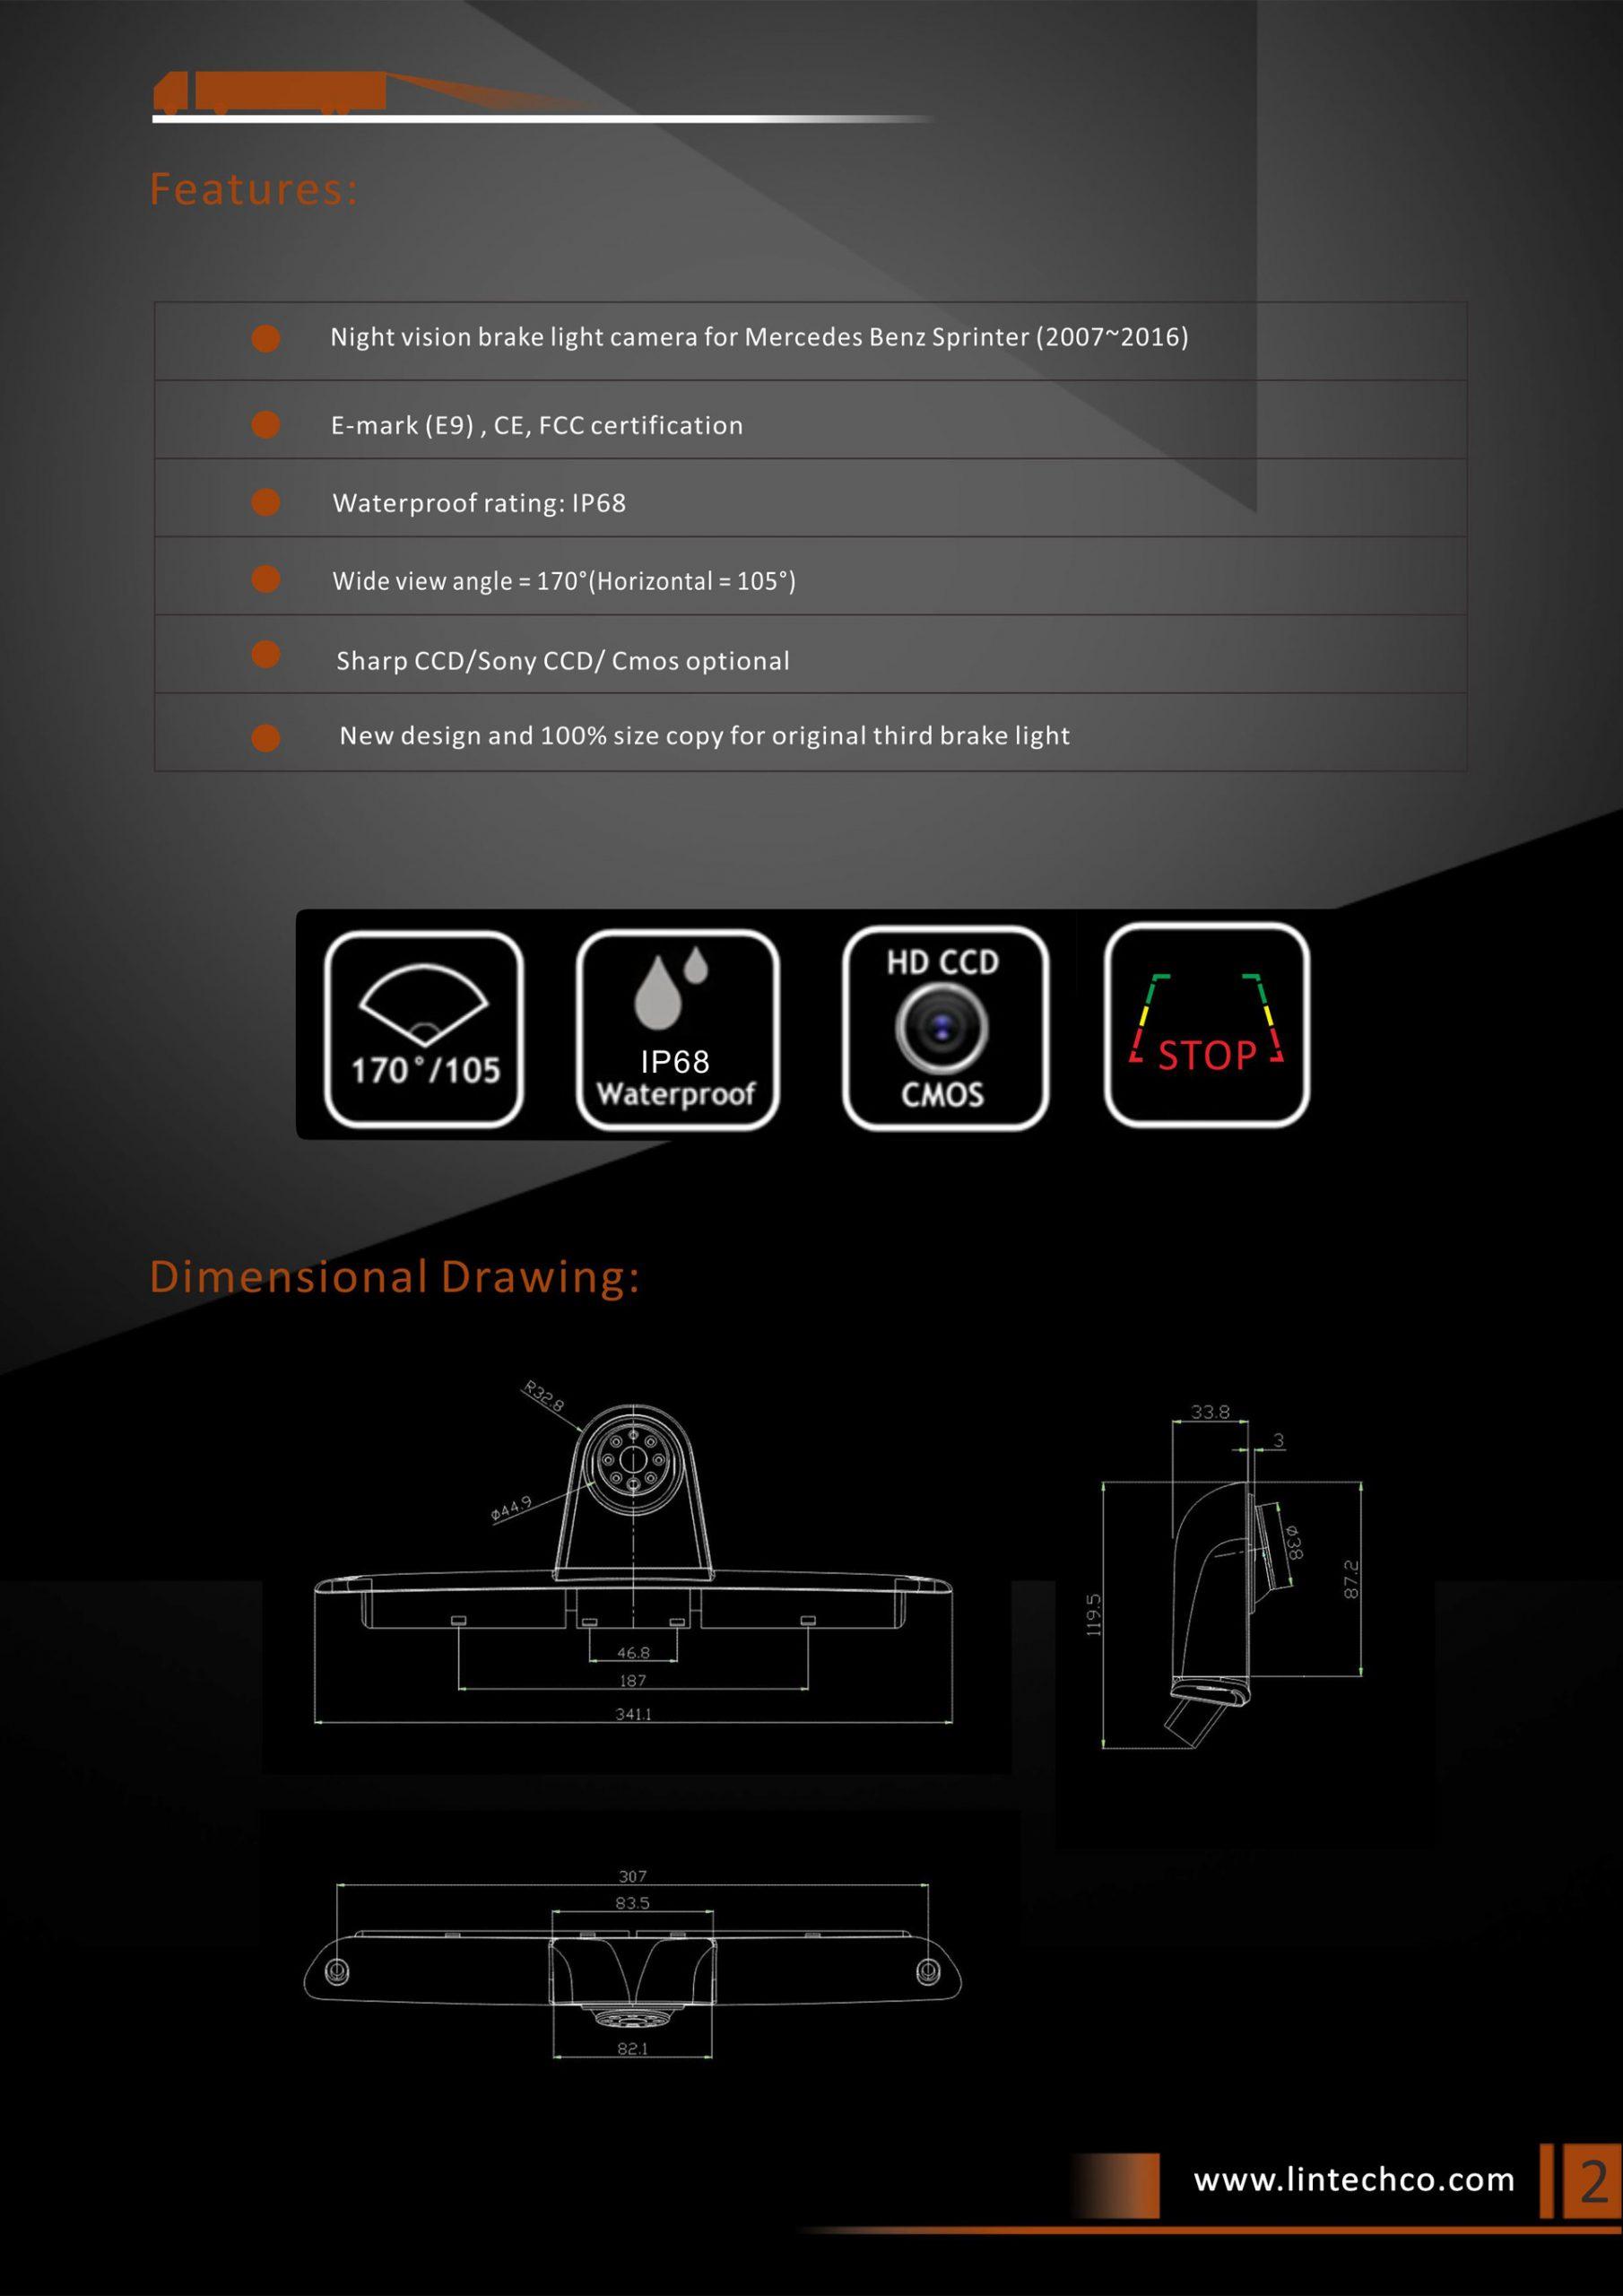 2. Backup Night Vision Brake Light Camera for Mercedes Benz Sprinter